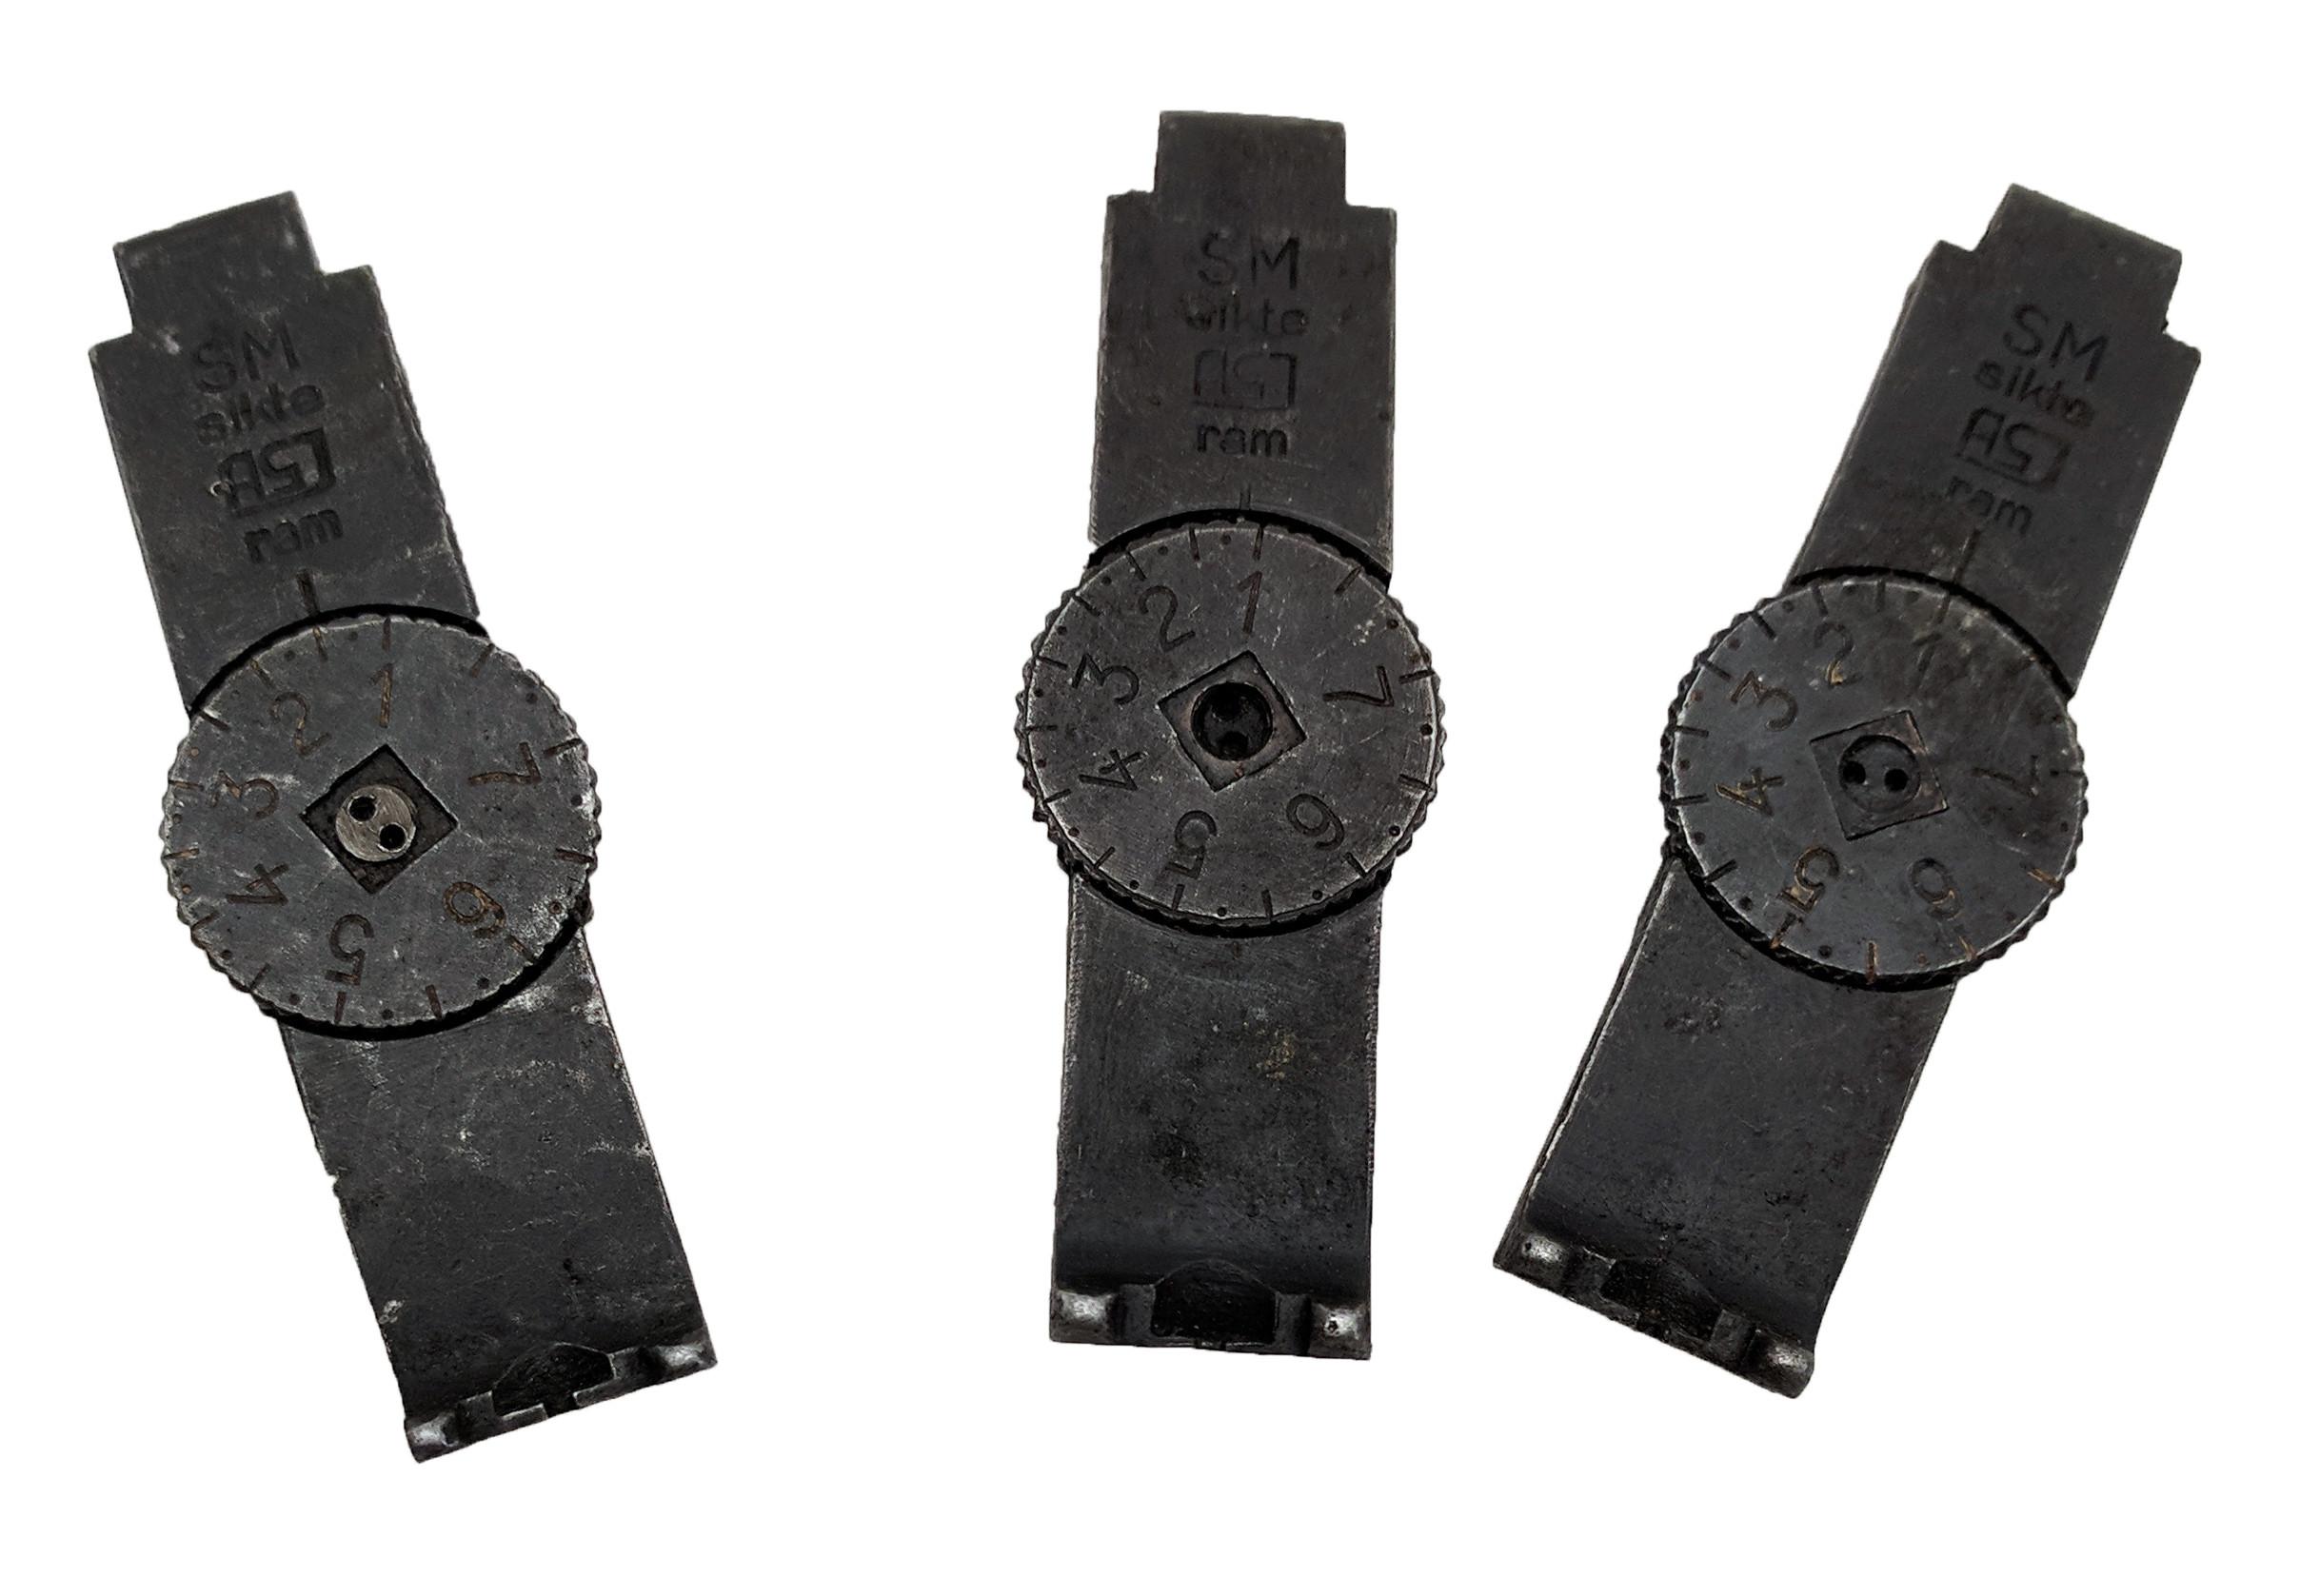 "Swedish Mauser ""ASJ ram"" Rear Sight"